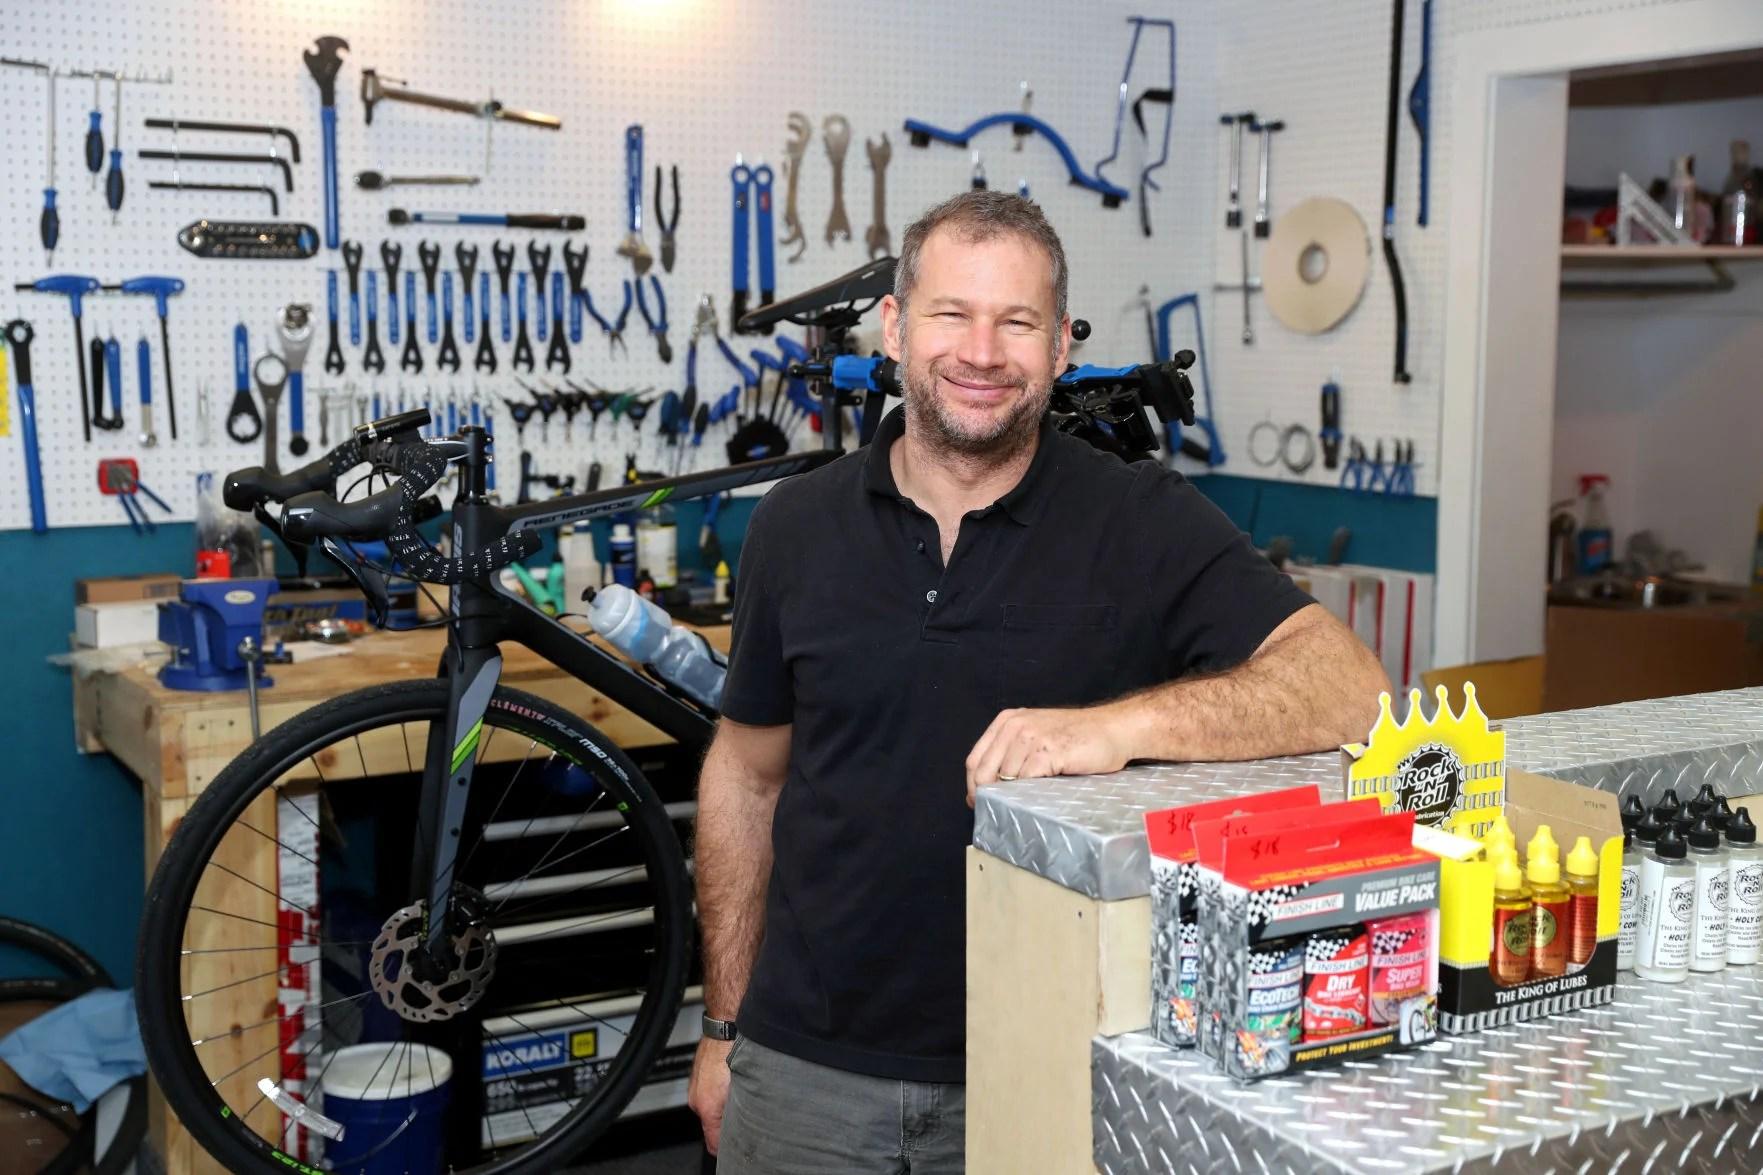 wheelchair jobs white wood high chair local bicycle shops dailyprogress